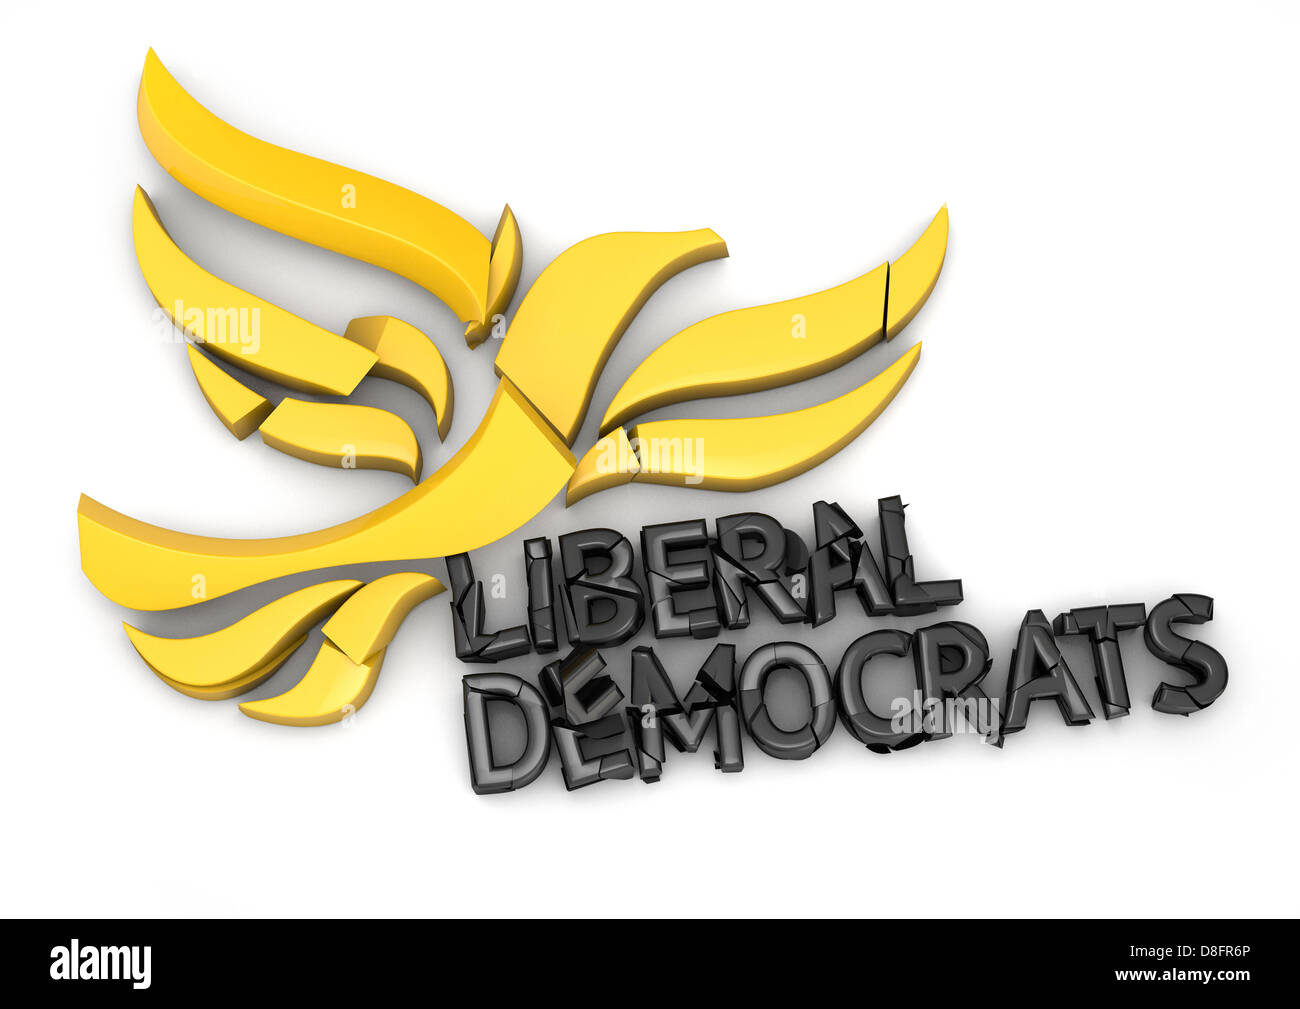 Crumbling Liberal Democrats logo falling apart - Stock Image